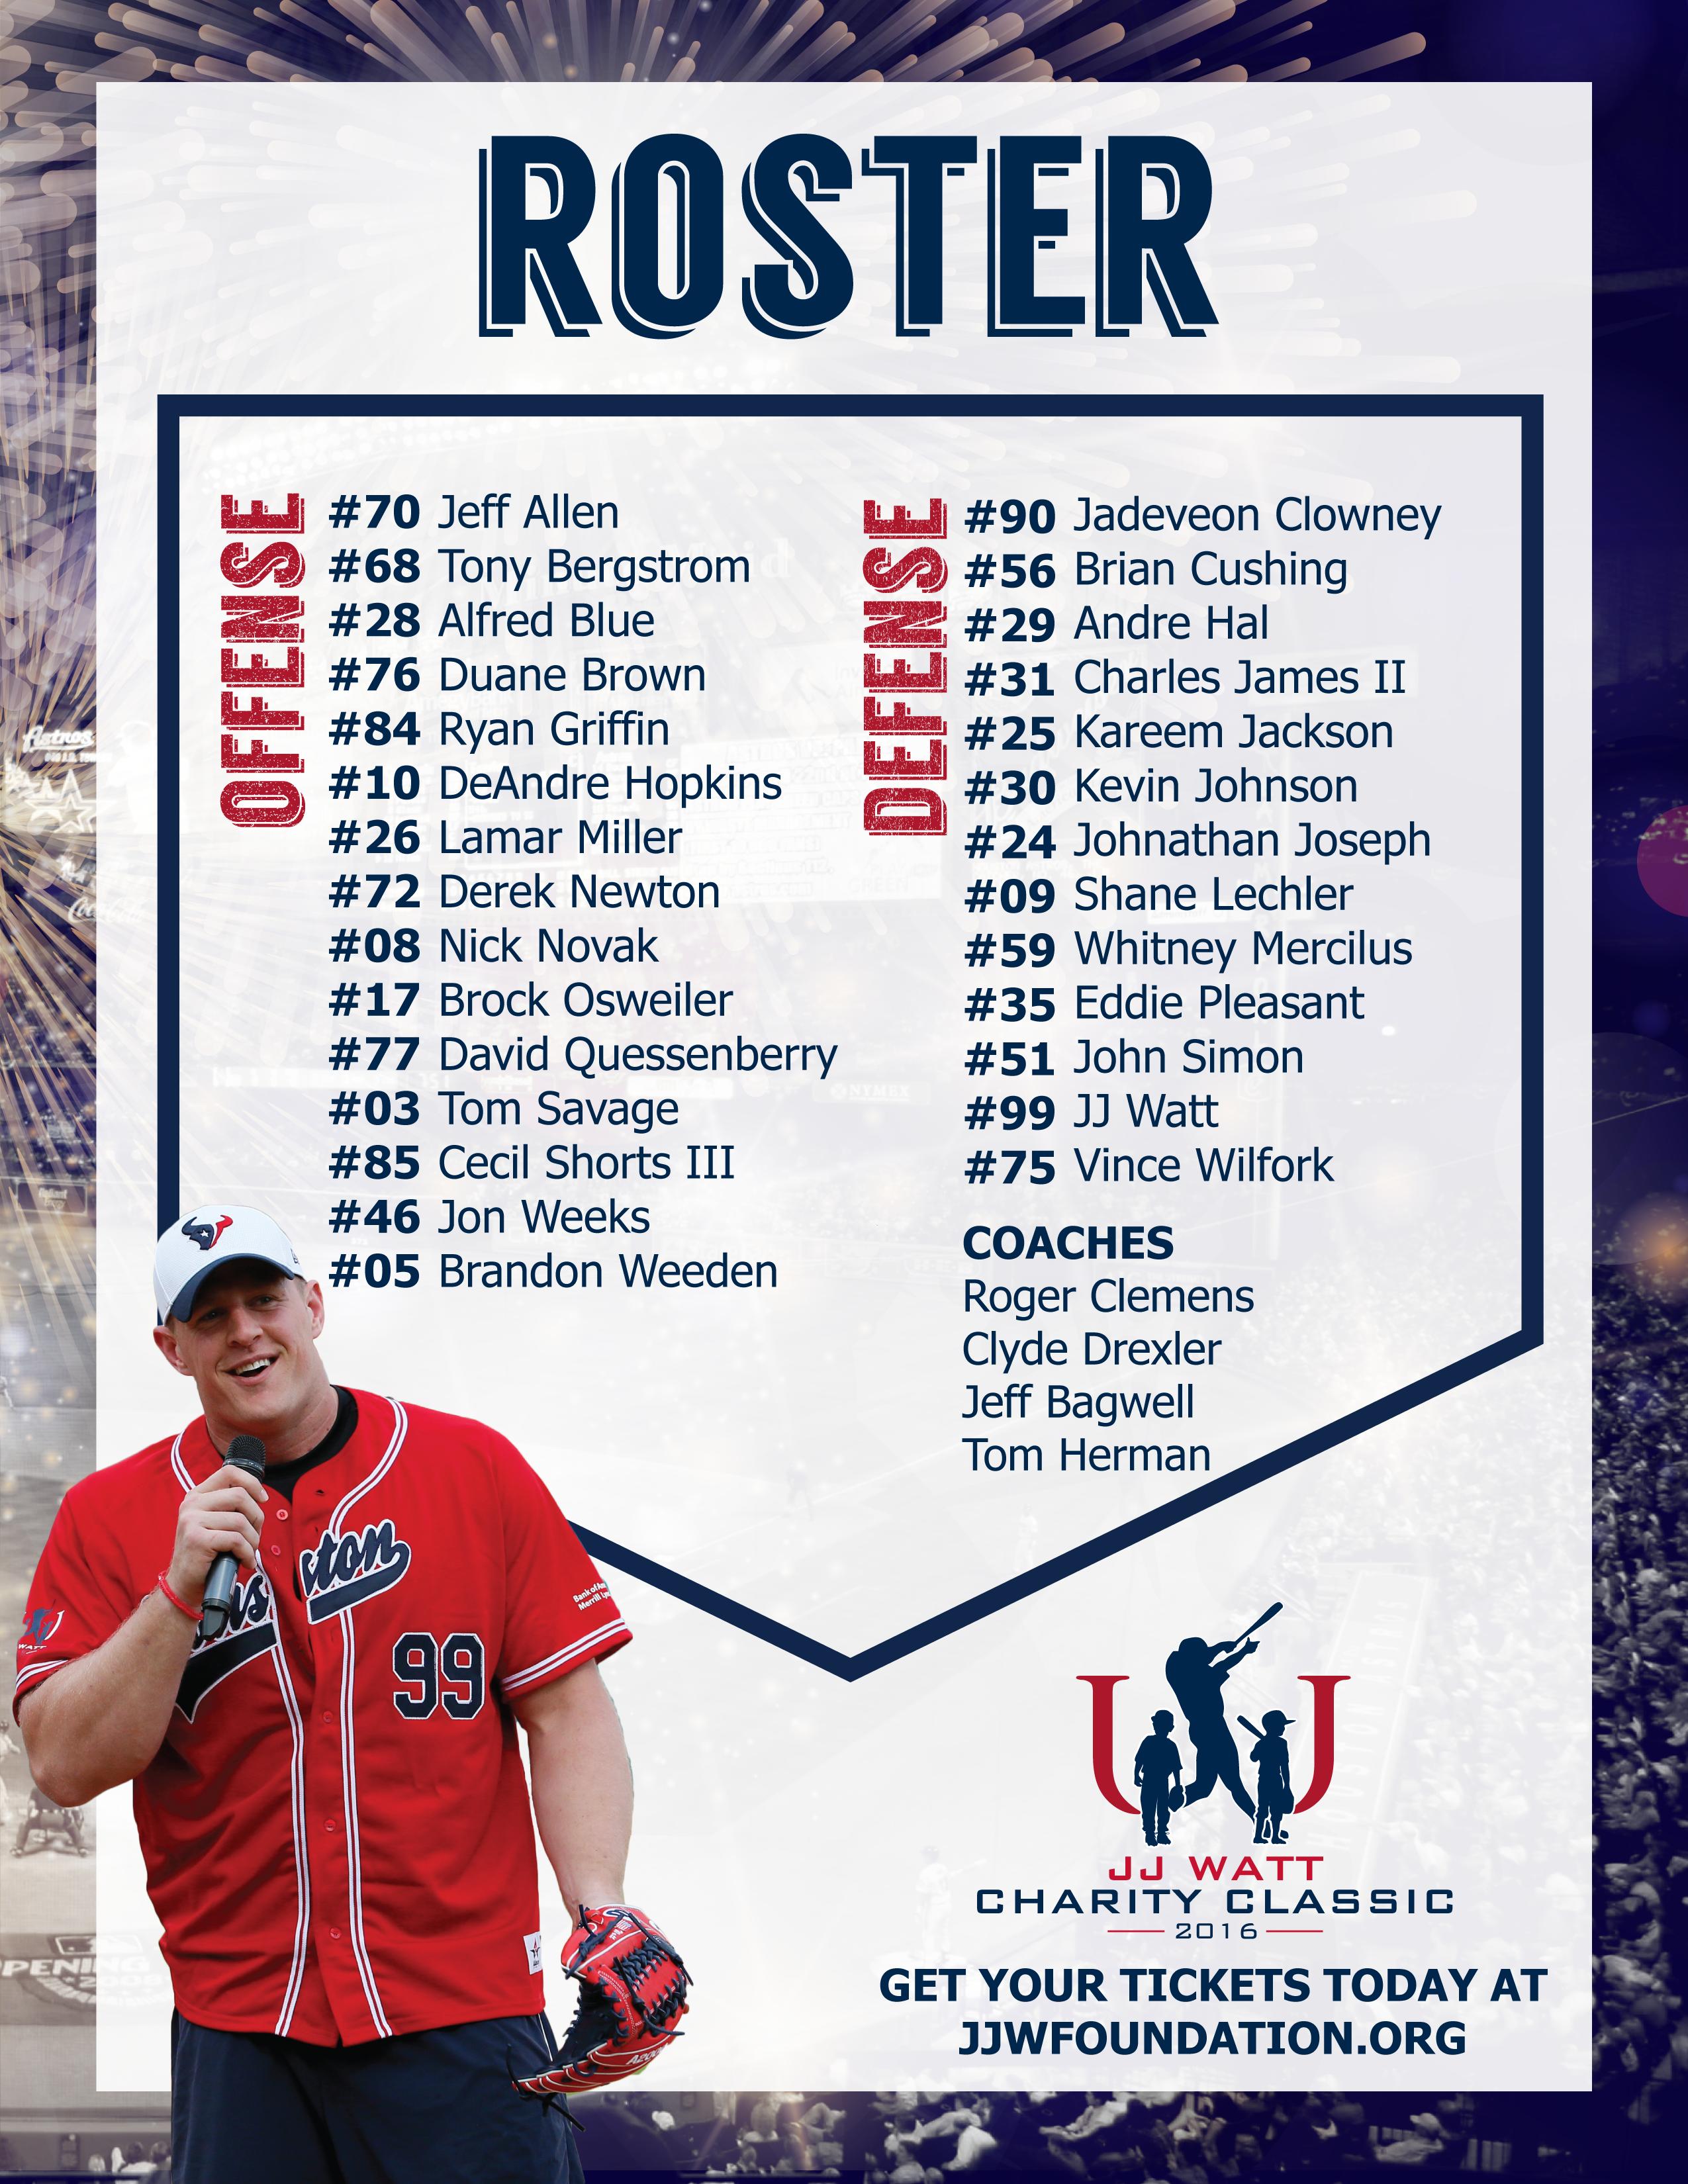 2016 JJWF Roster